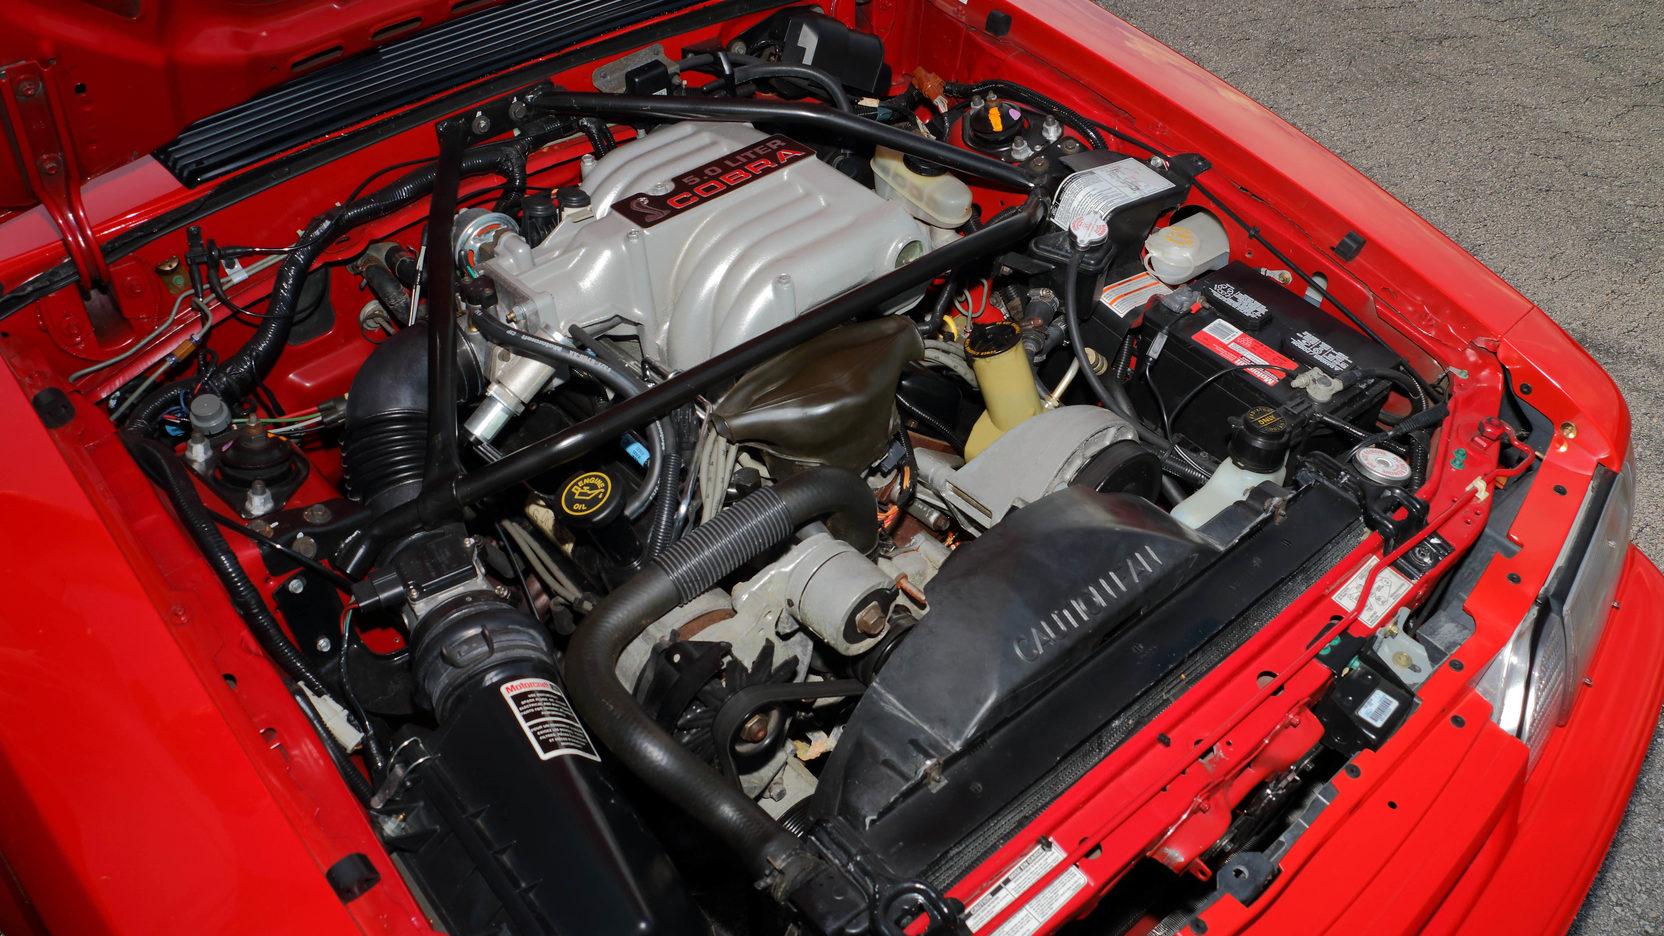 1993 Ford Mustang SVT Cobra R engine